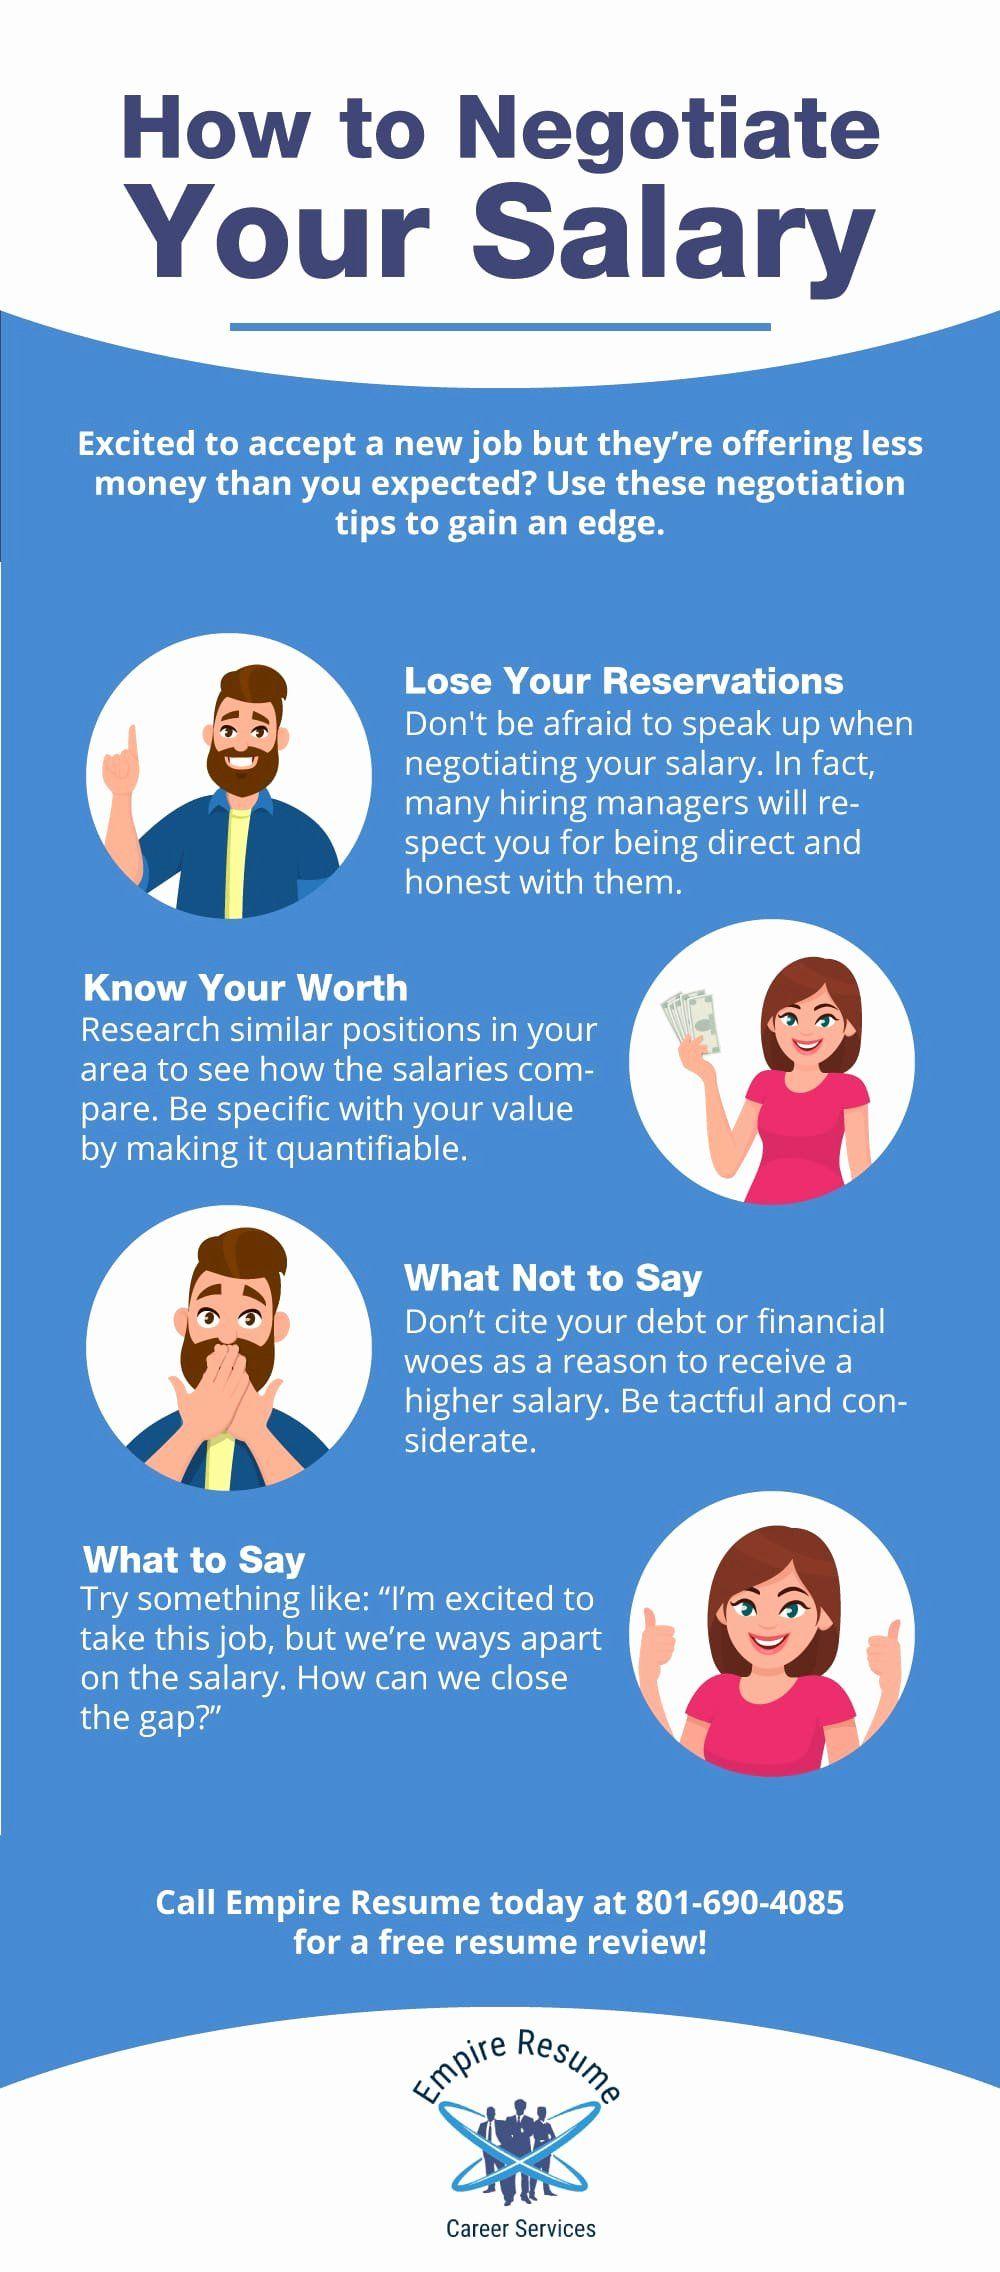 Certified Resume Writer Salary Luxury How to Negotiate